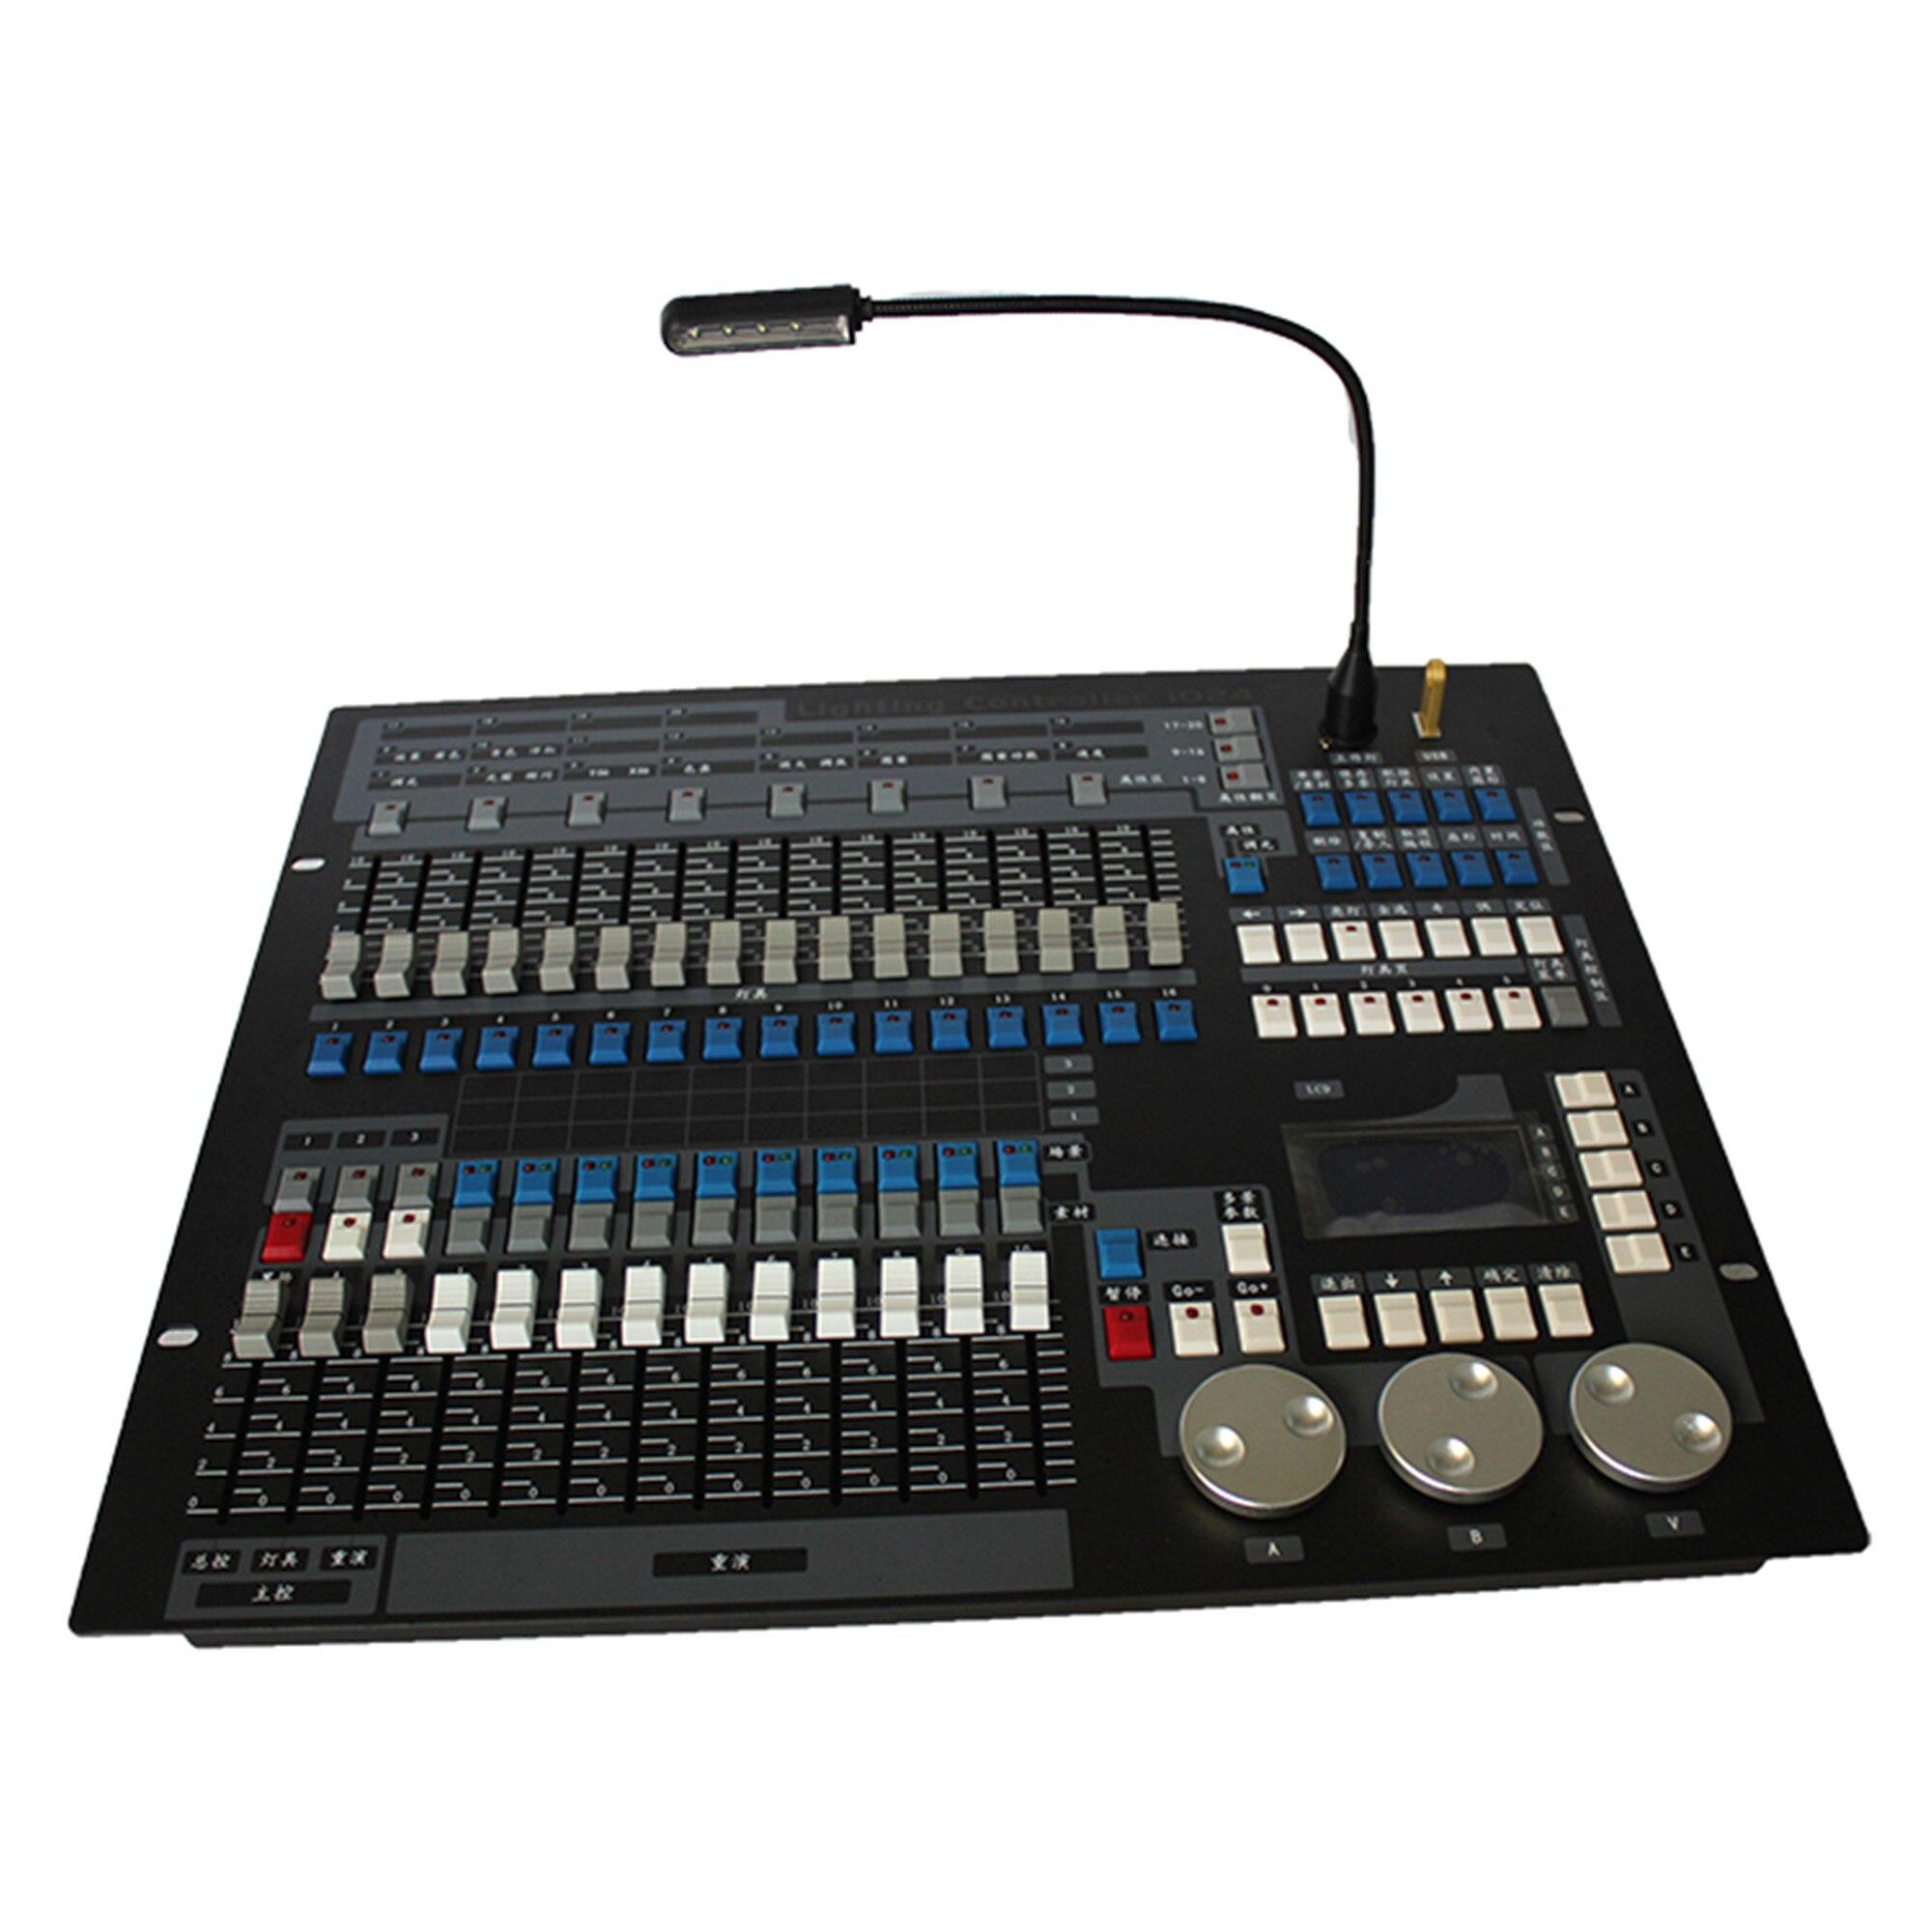 1x DMX 1024 controlador de luz de escenario 1024 haz de consola...